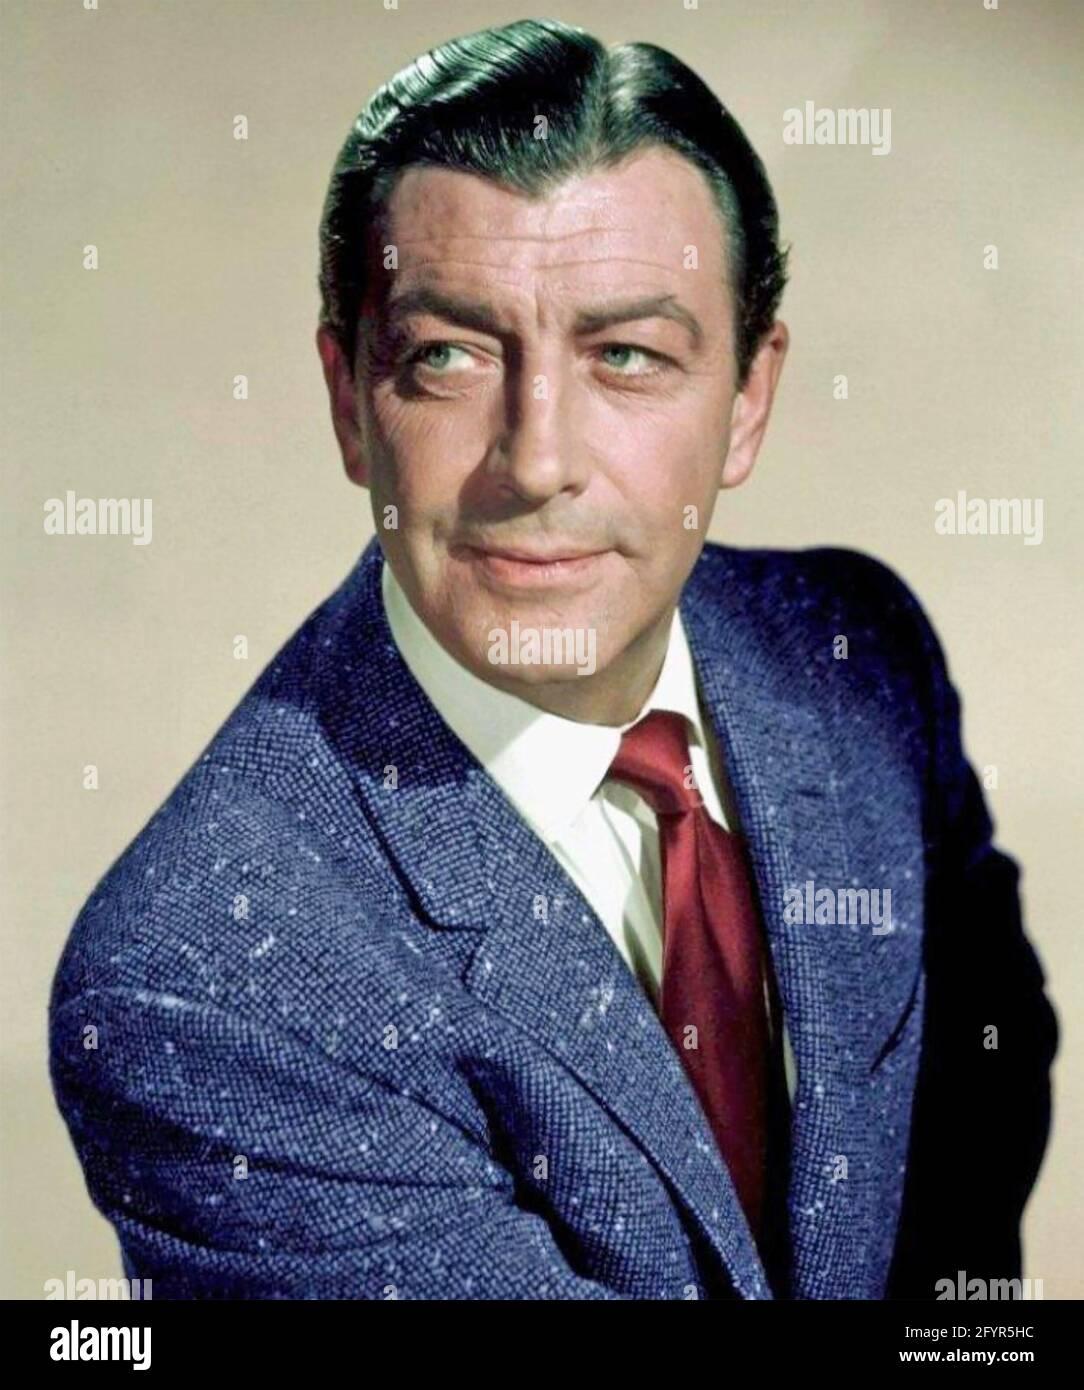 ROBERT TAYLOR (1911-1969) actor de cine estadounidense cerca de 1960 Foto de stock